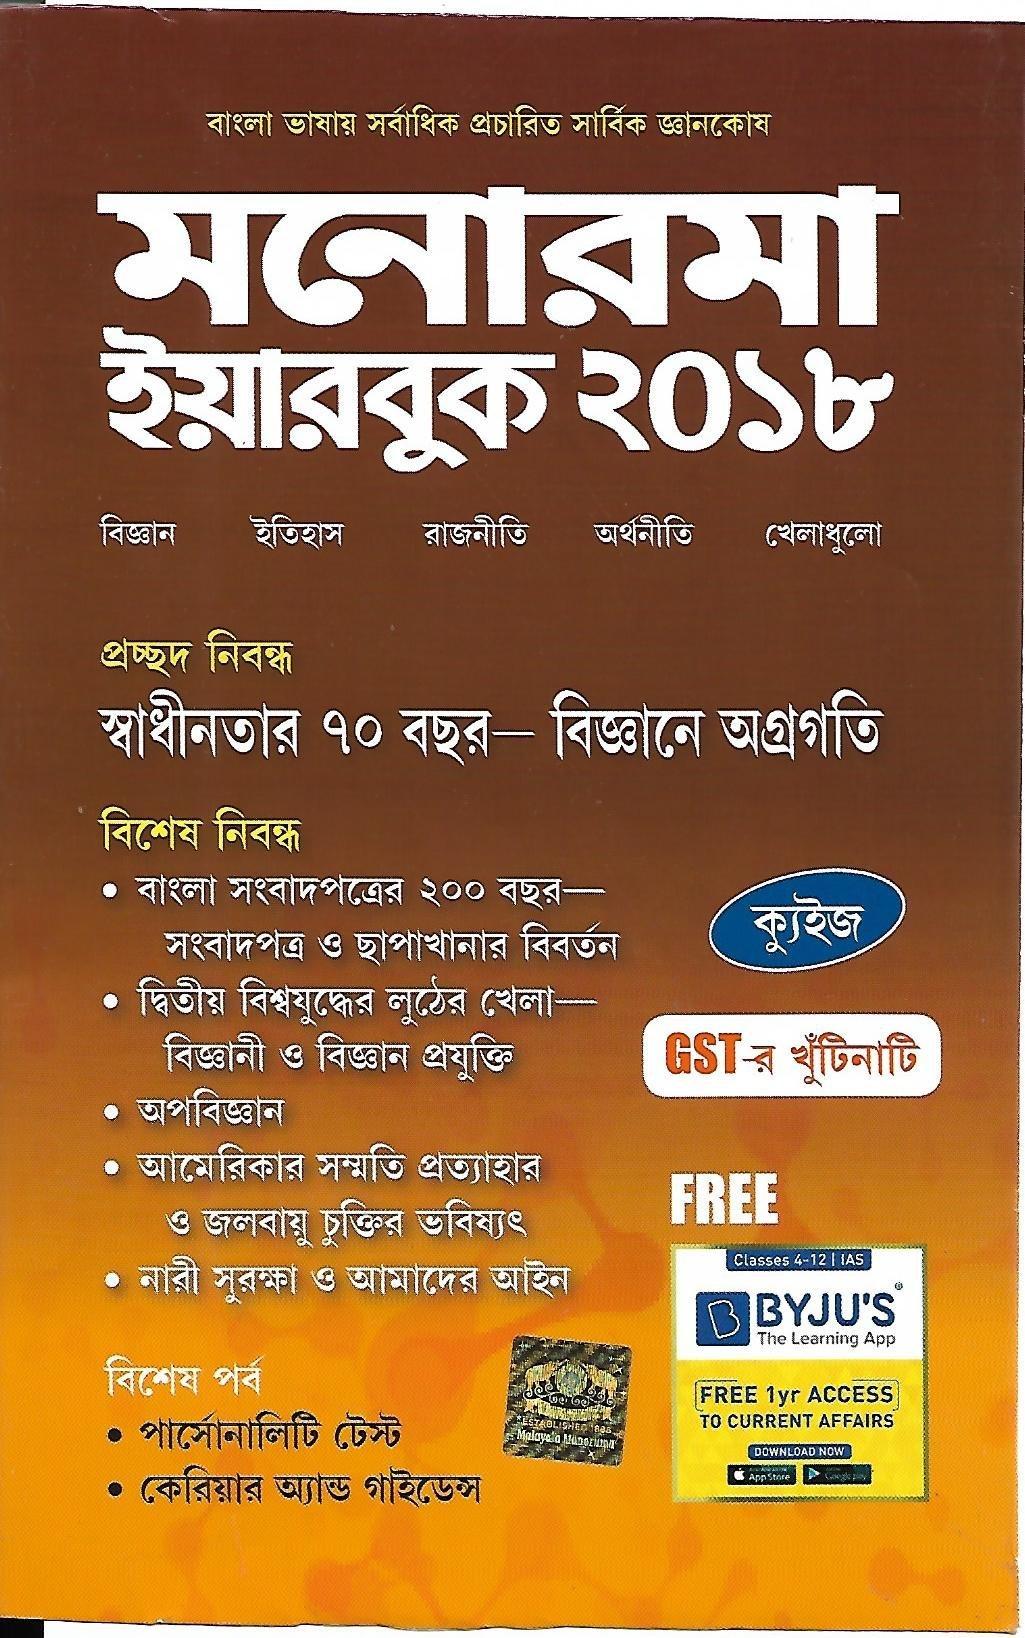 Buy manorama yearbook 2018 bengali language book online at low buy manorama yearbook 2018 bengali language book online at low prices in india manorama yearbook 2018 bengali language reviews ratings amazon fandeluxe Gallery